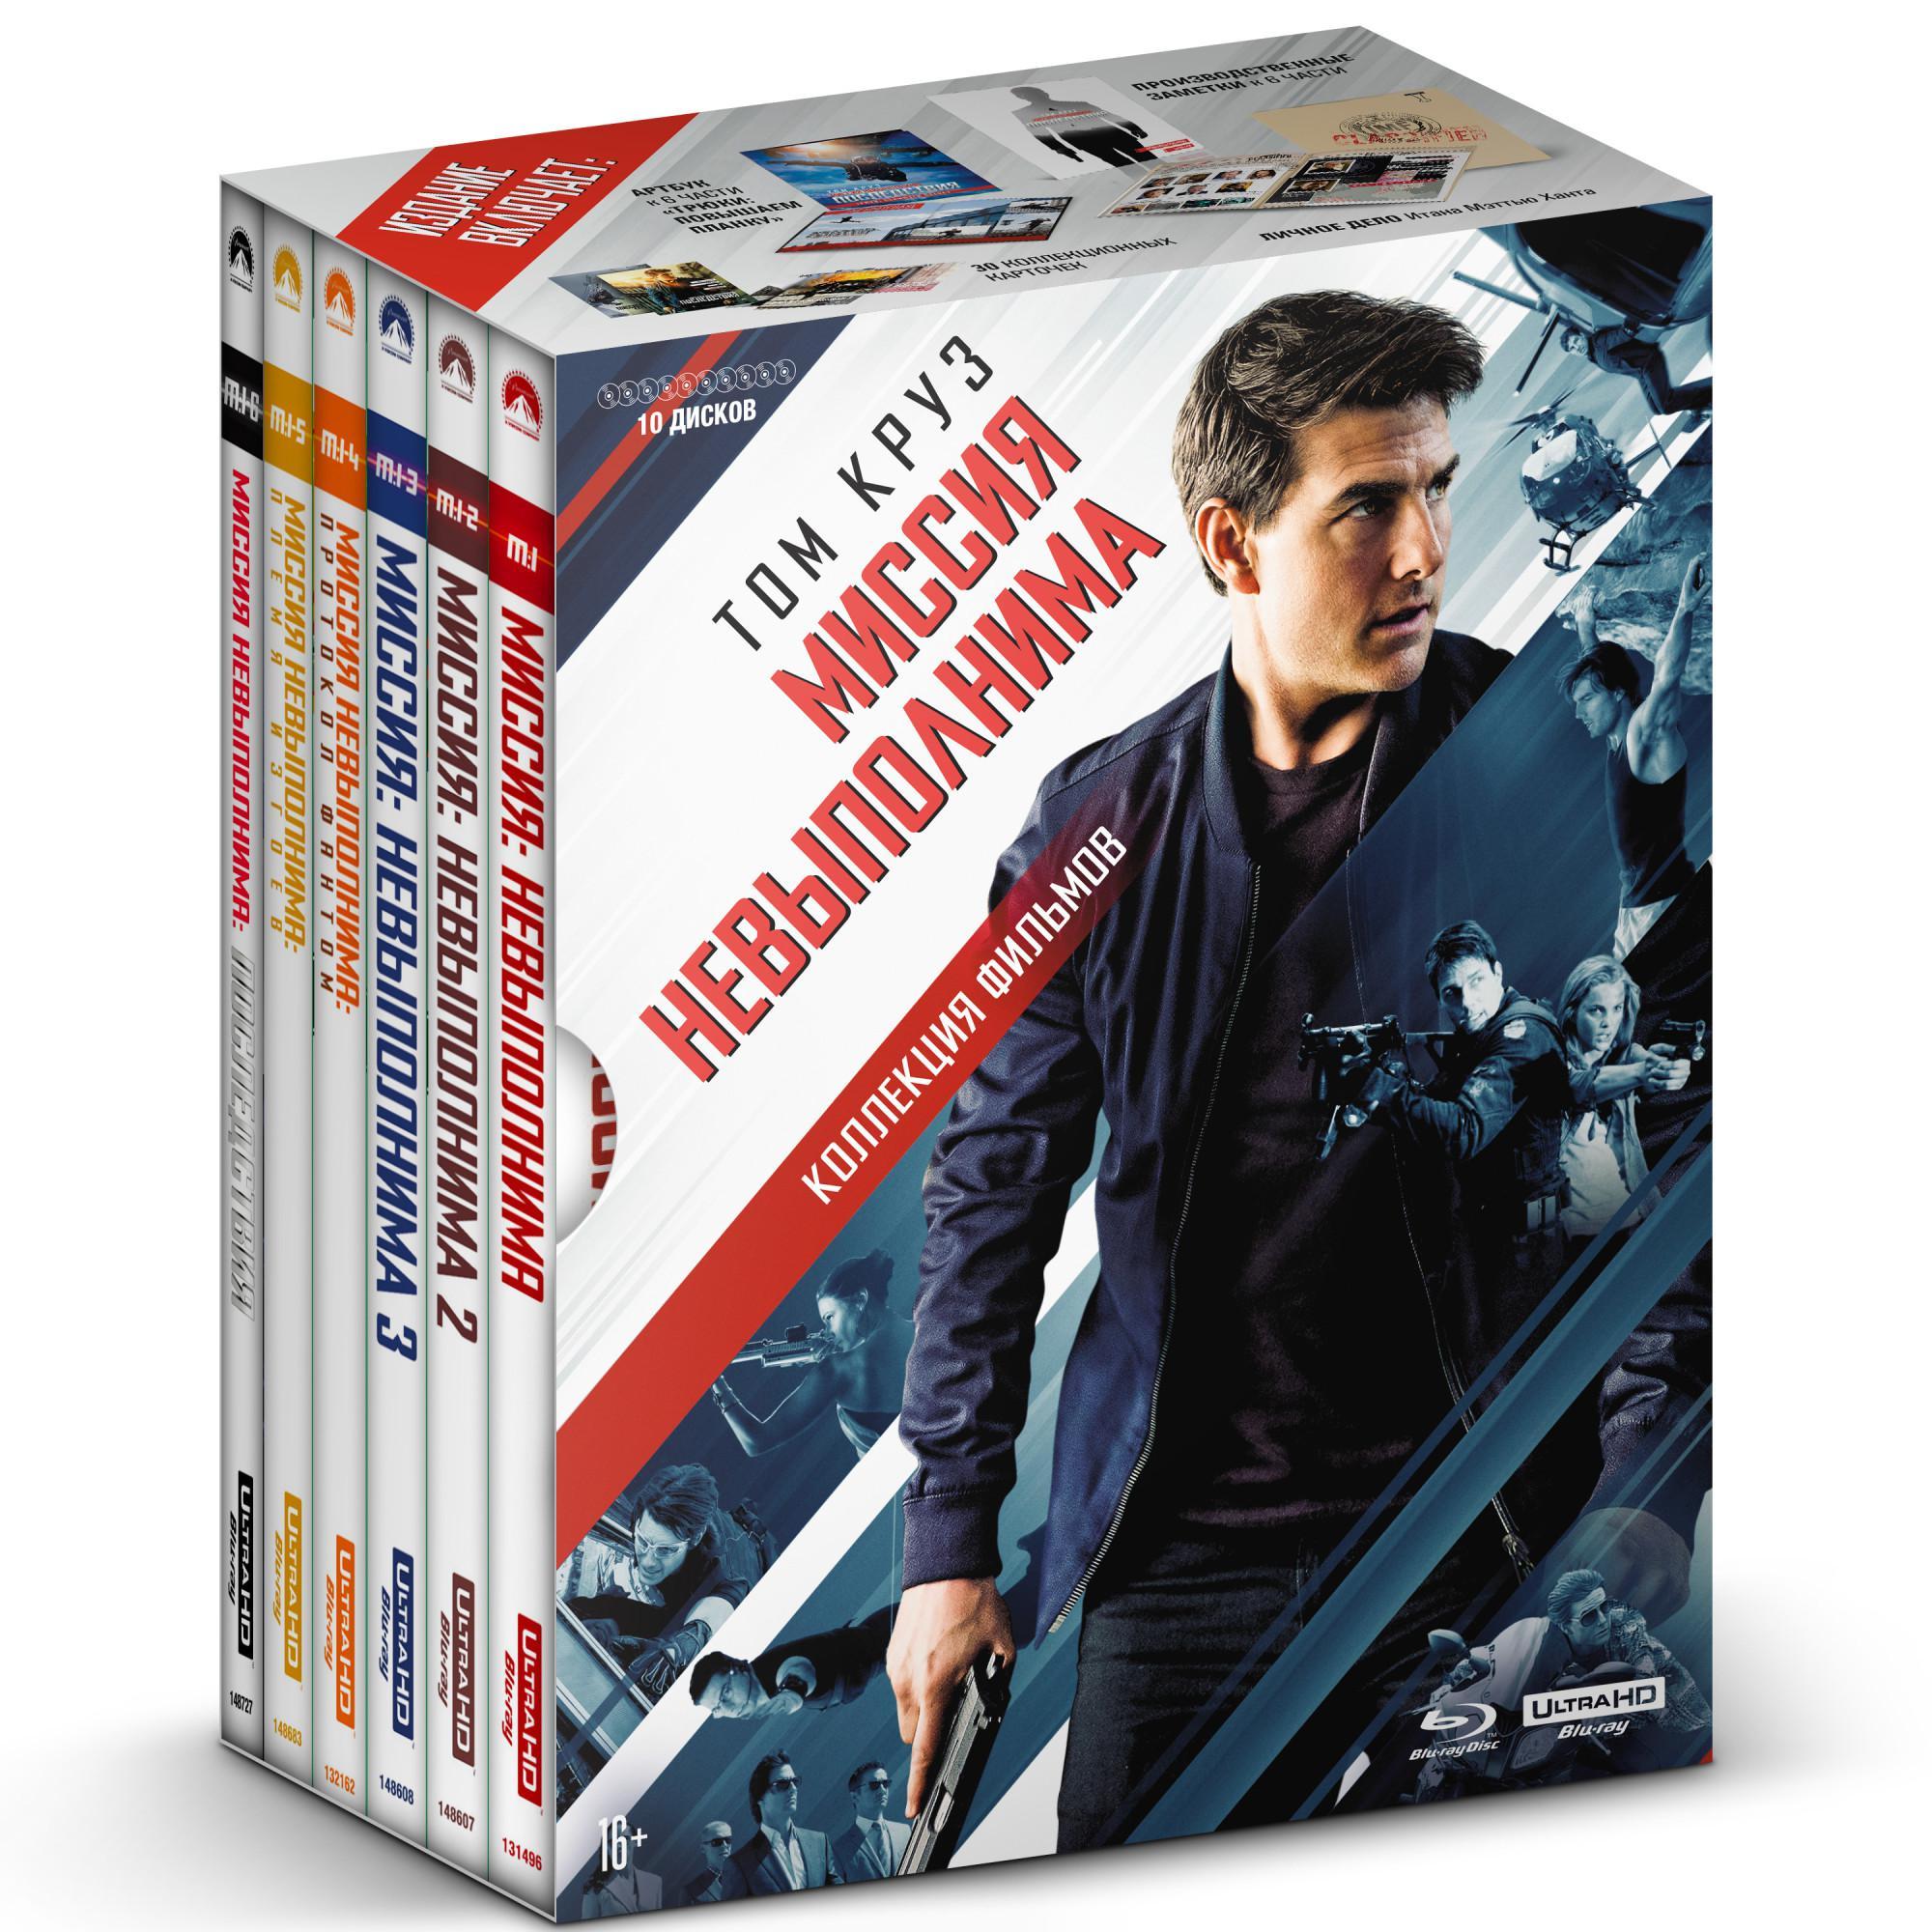 Blu-ray. Миссия невыполнима. Коллекция (6 Blu-Ray 4K Ultra HD + 4 Blu-Ray) + буклет и карточки (количество Blu-ray: 10)